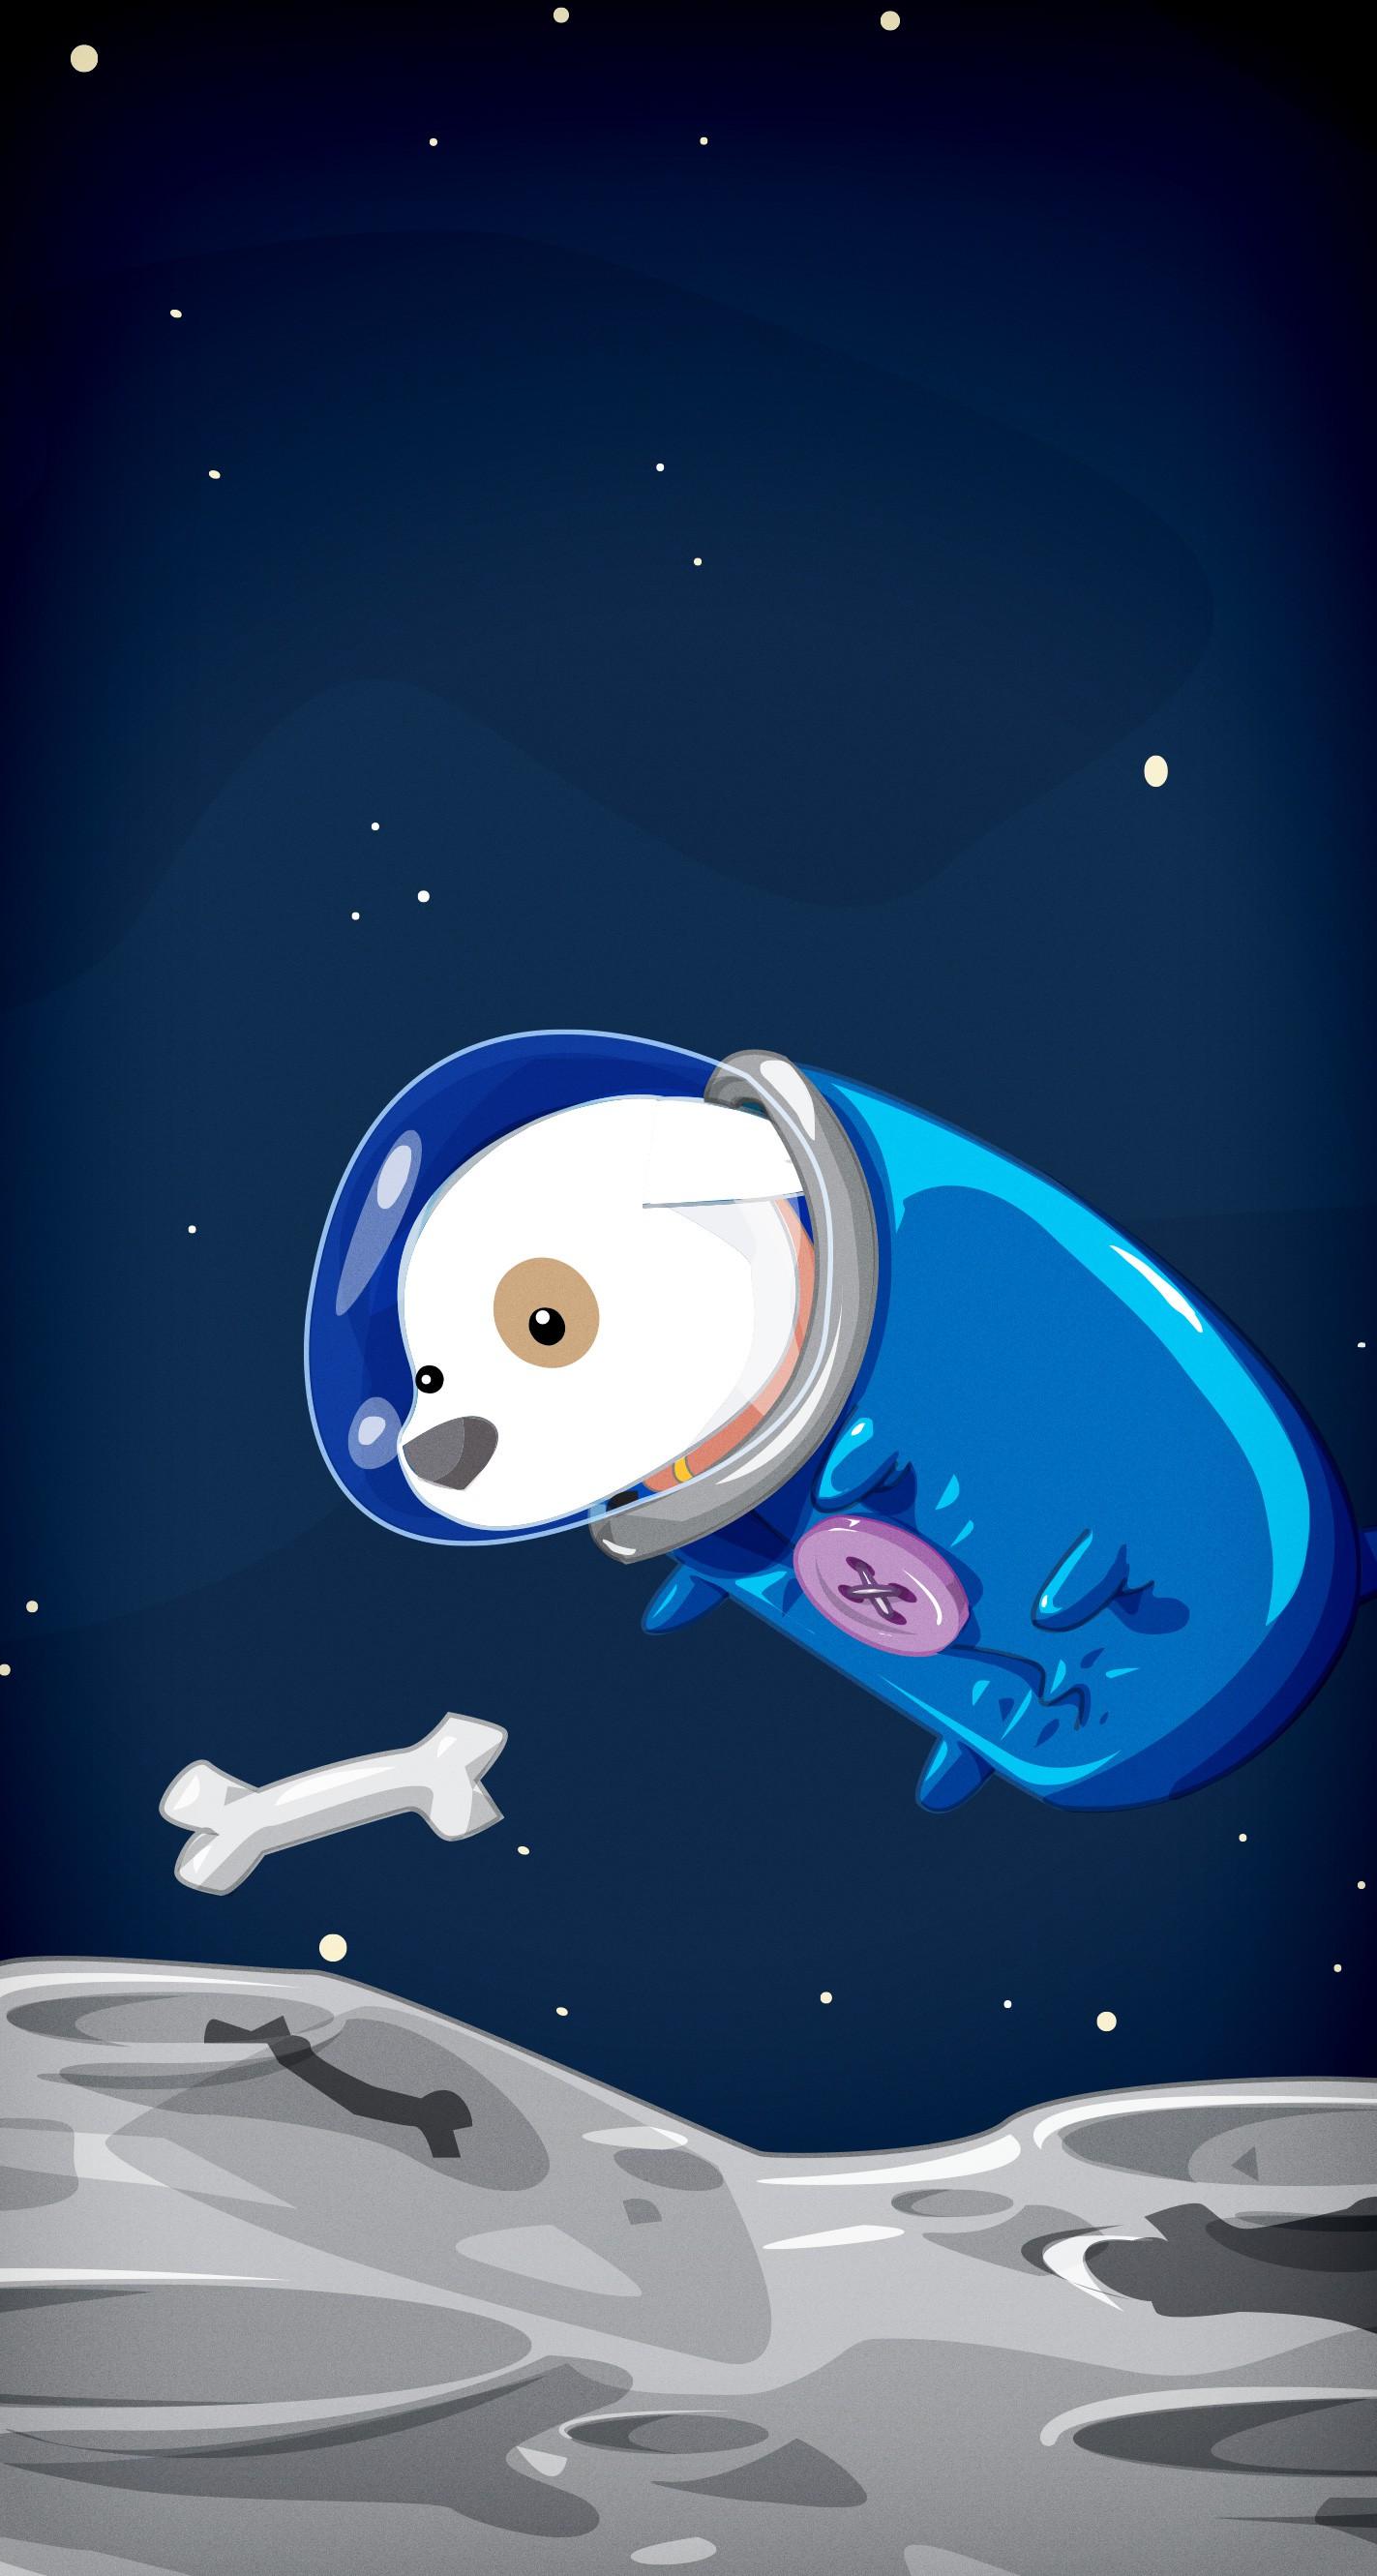 Cool Space Iphone Wallpaper David Lanham Space Doggy